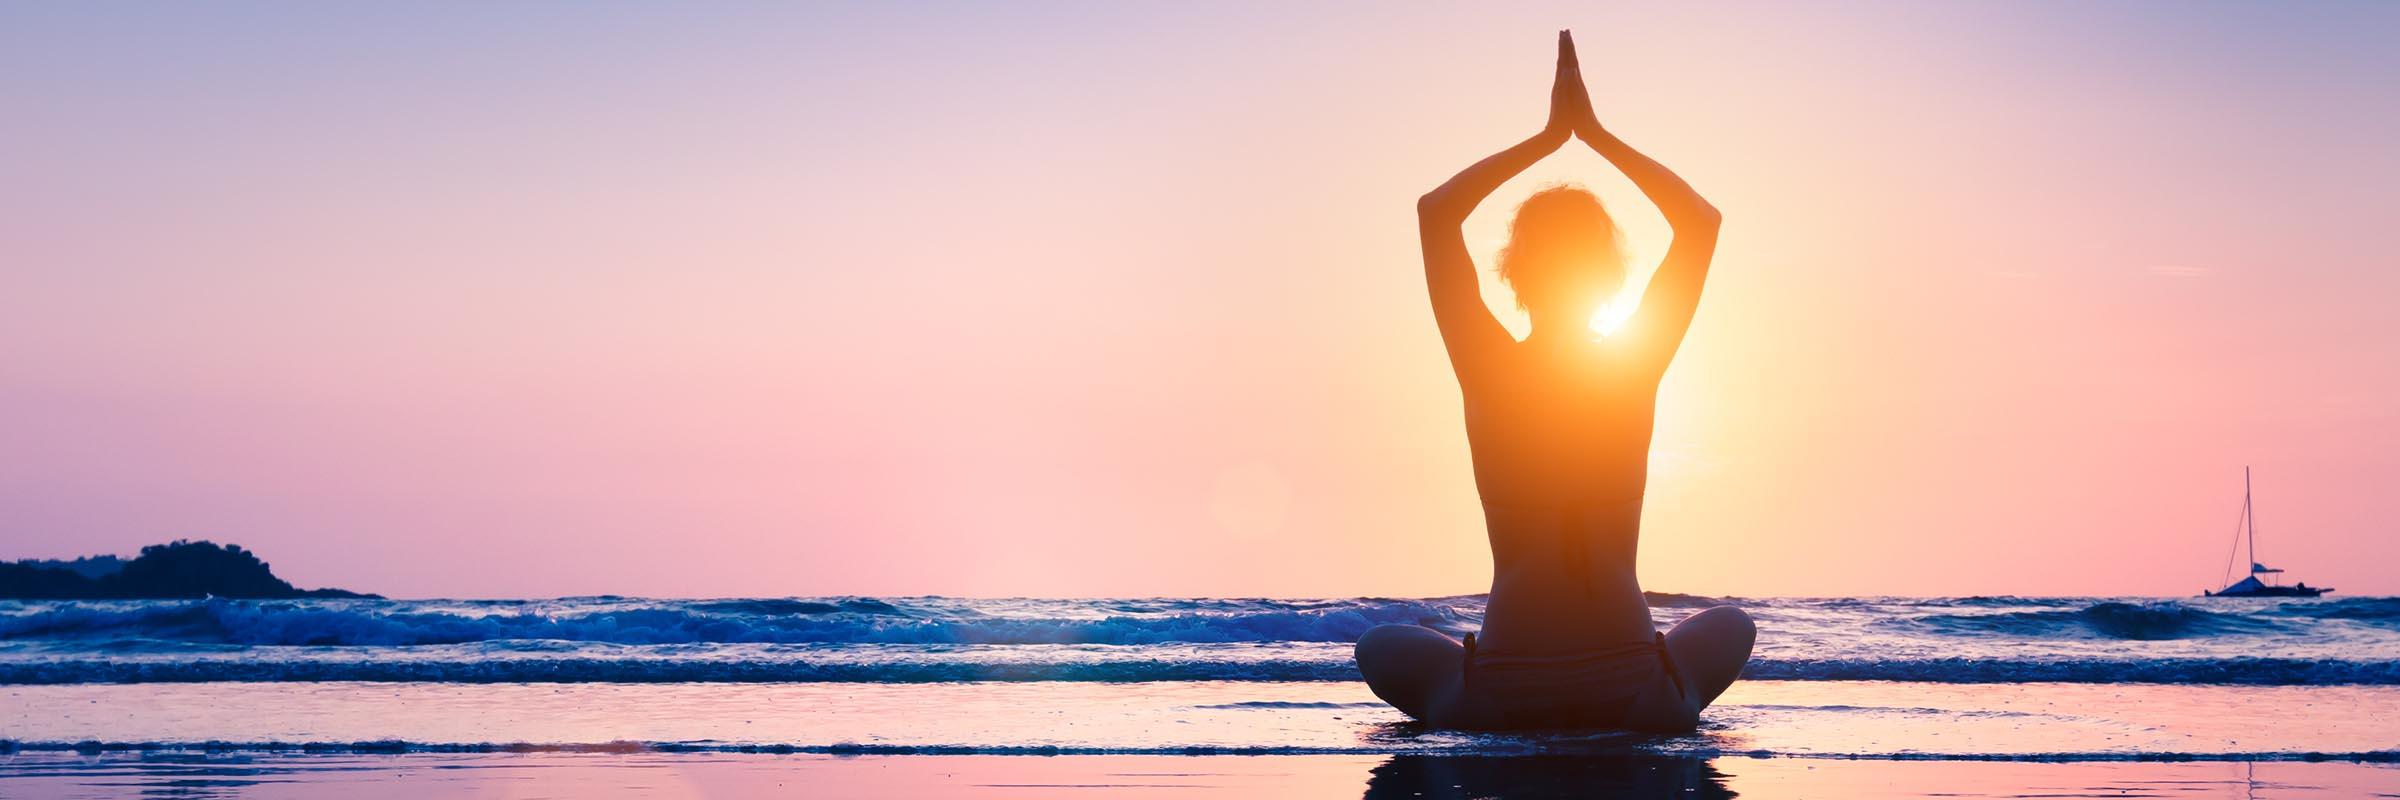 Yogi on the Beach at Sunset